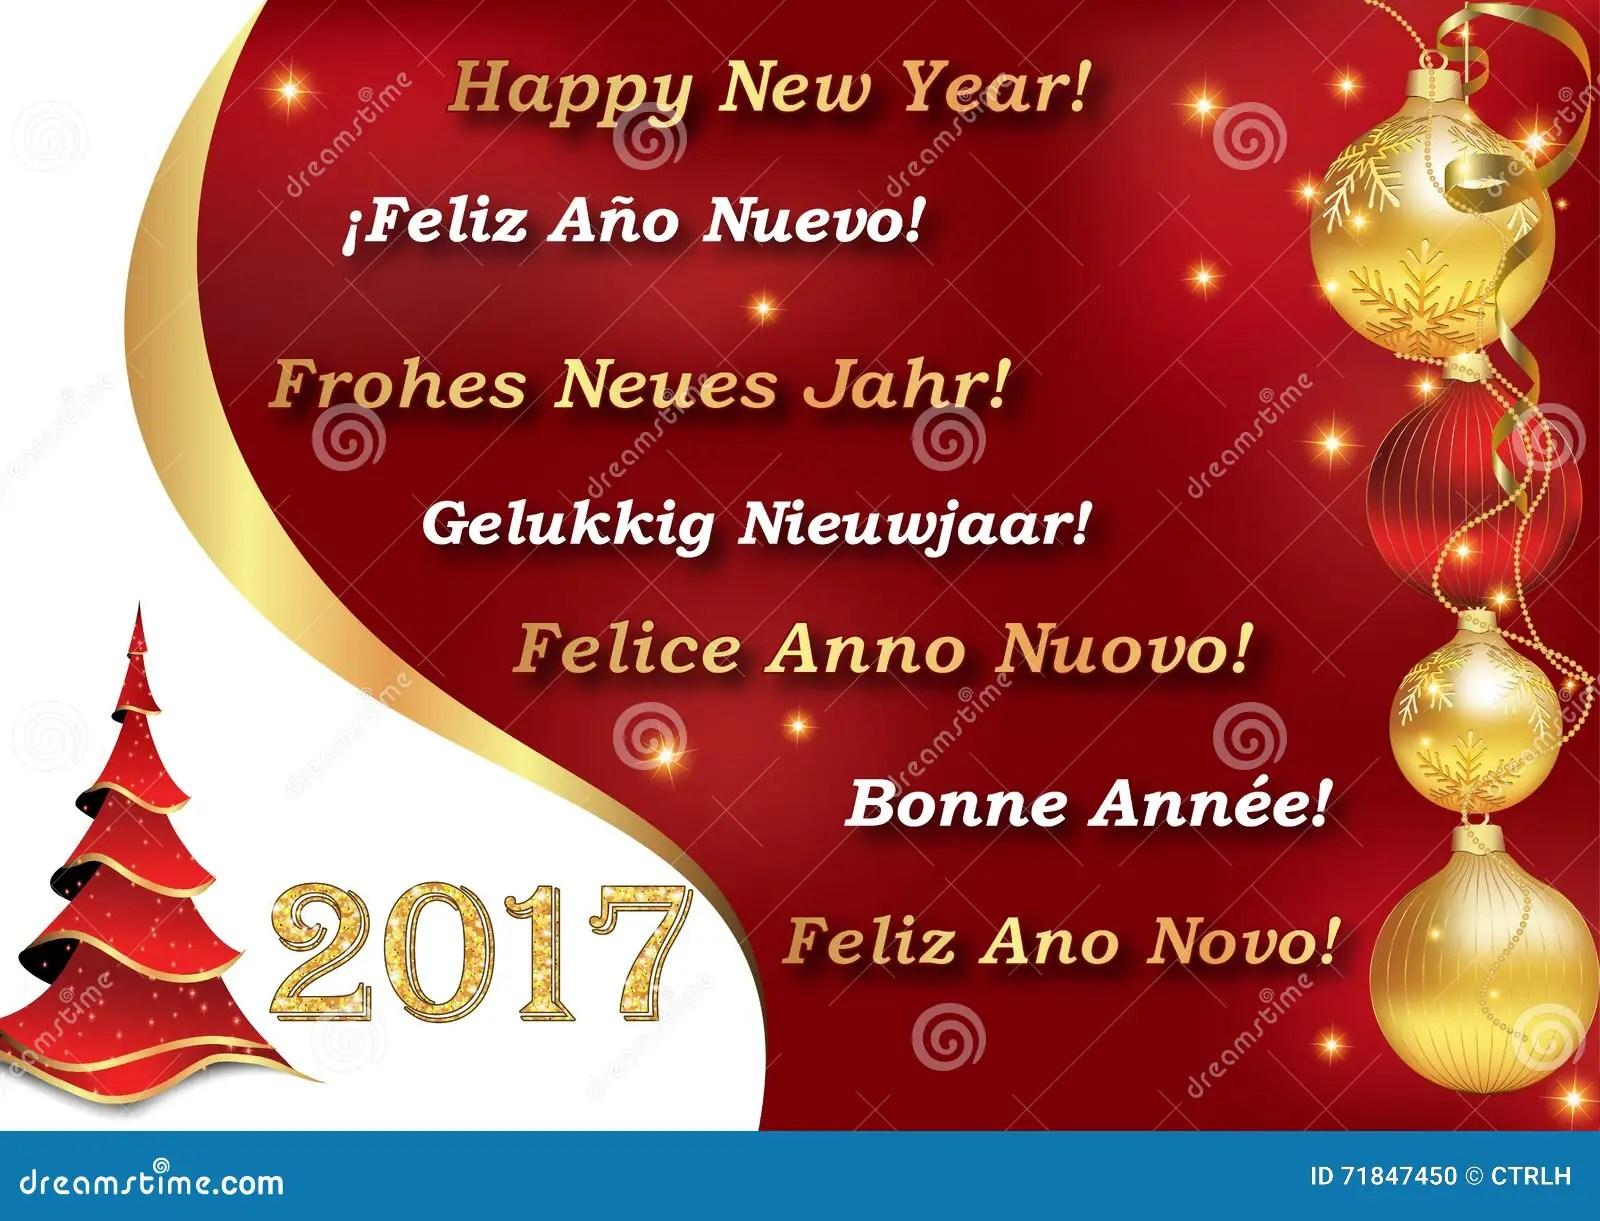 Greetings 123 Christmas Cards In Italian